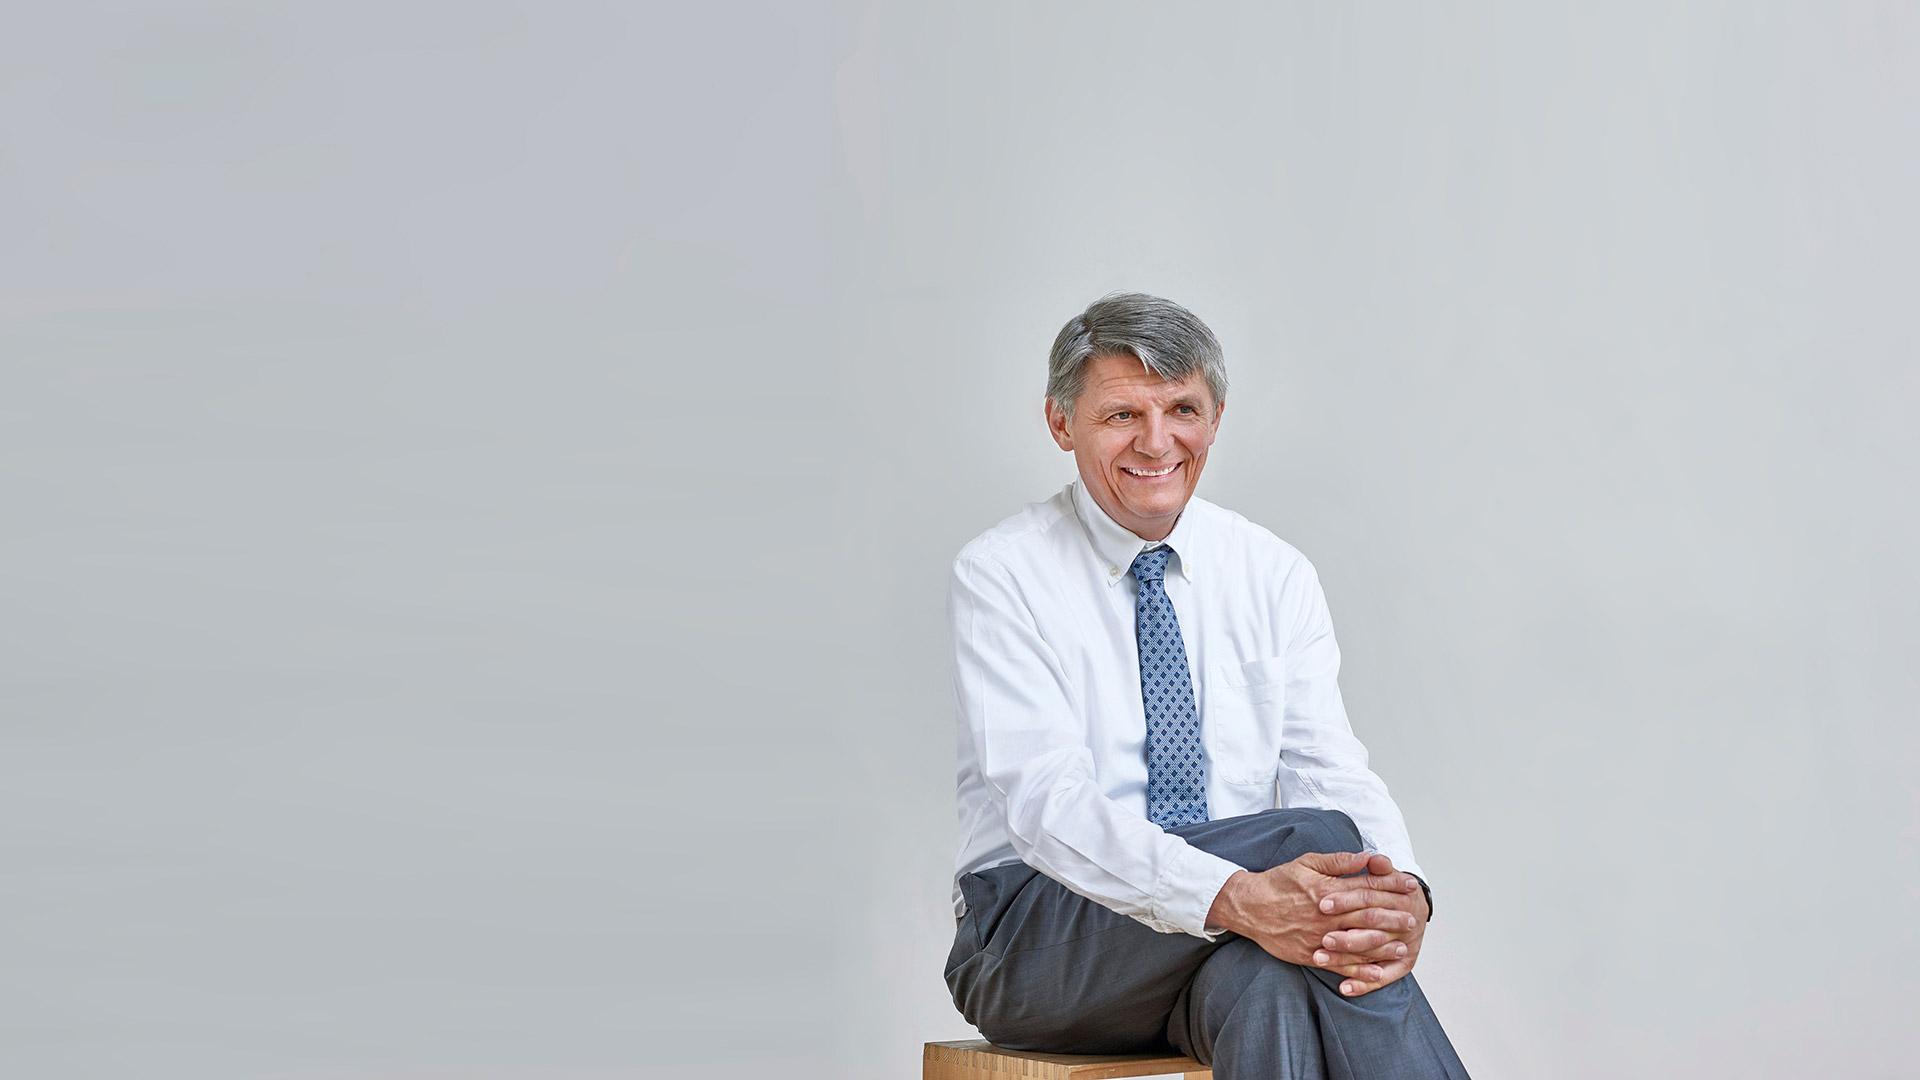 Martin Rivoir –Landtagsabgeordneter SPD, Wahlkreis Ulm/Alb-Donau –Blog, Startbild